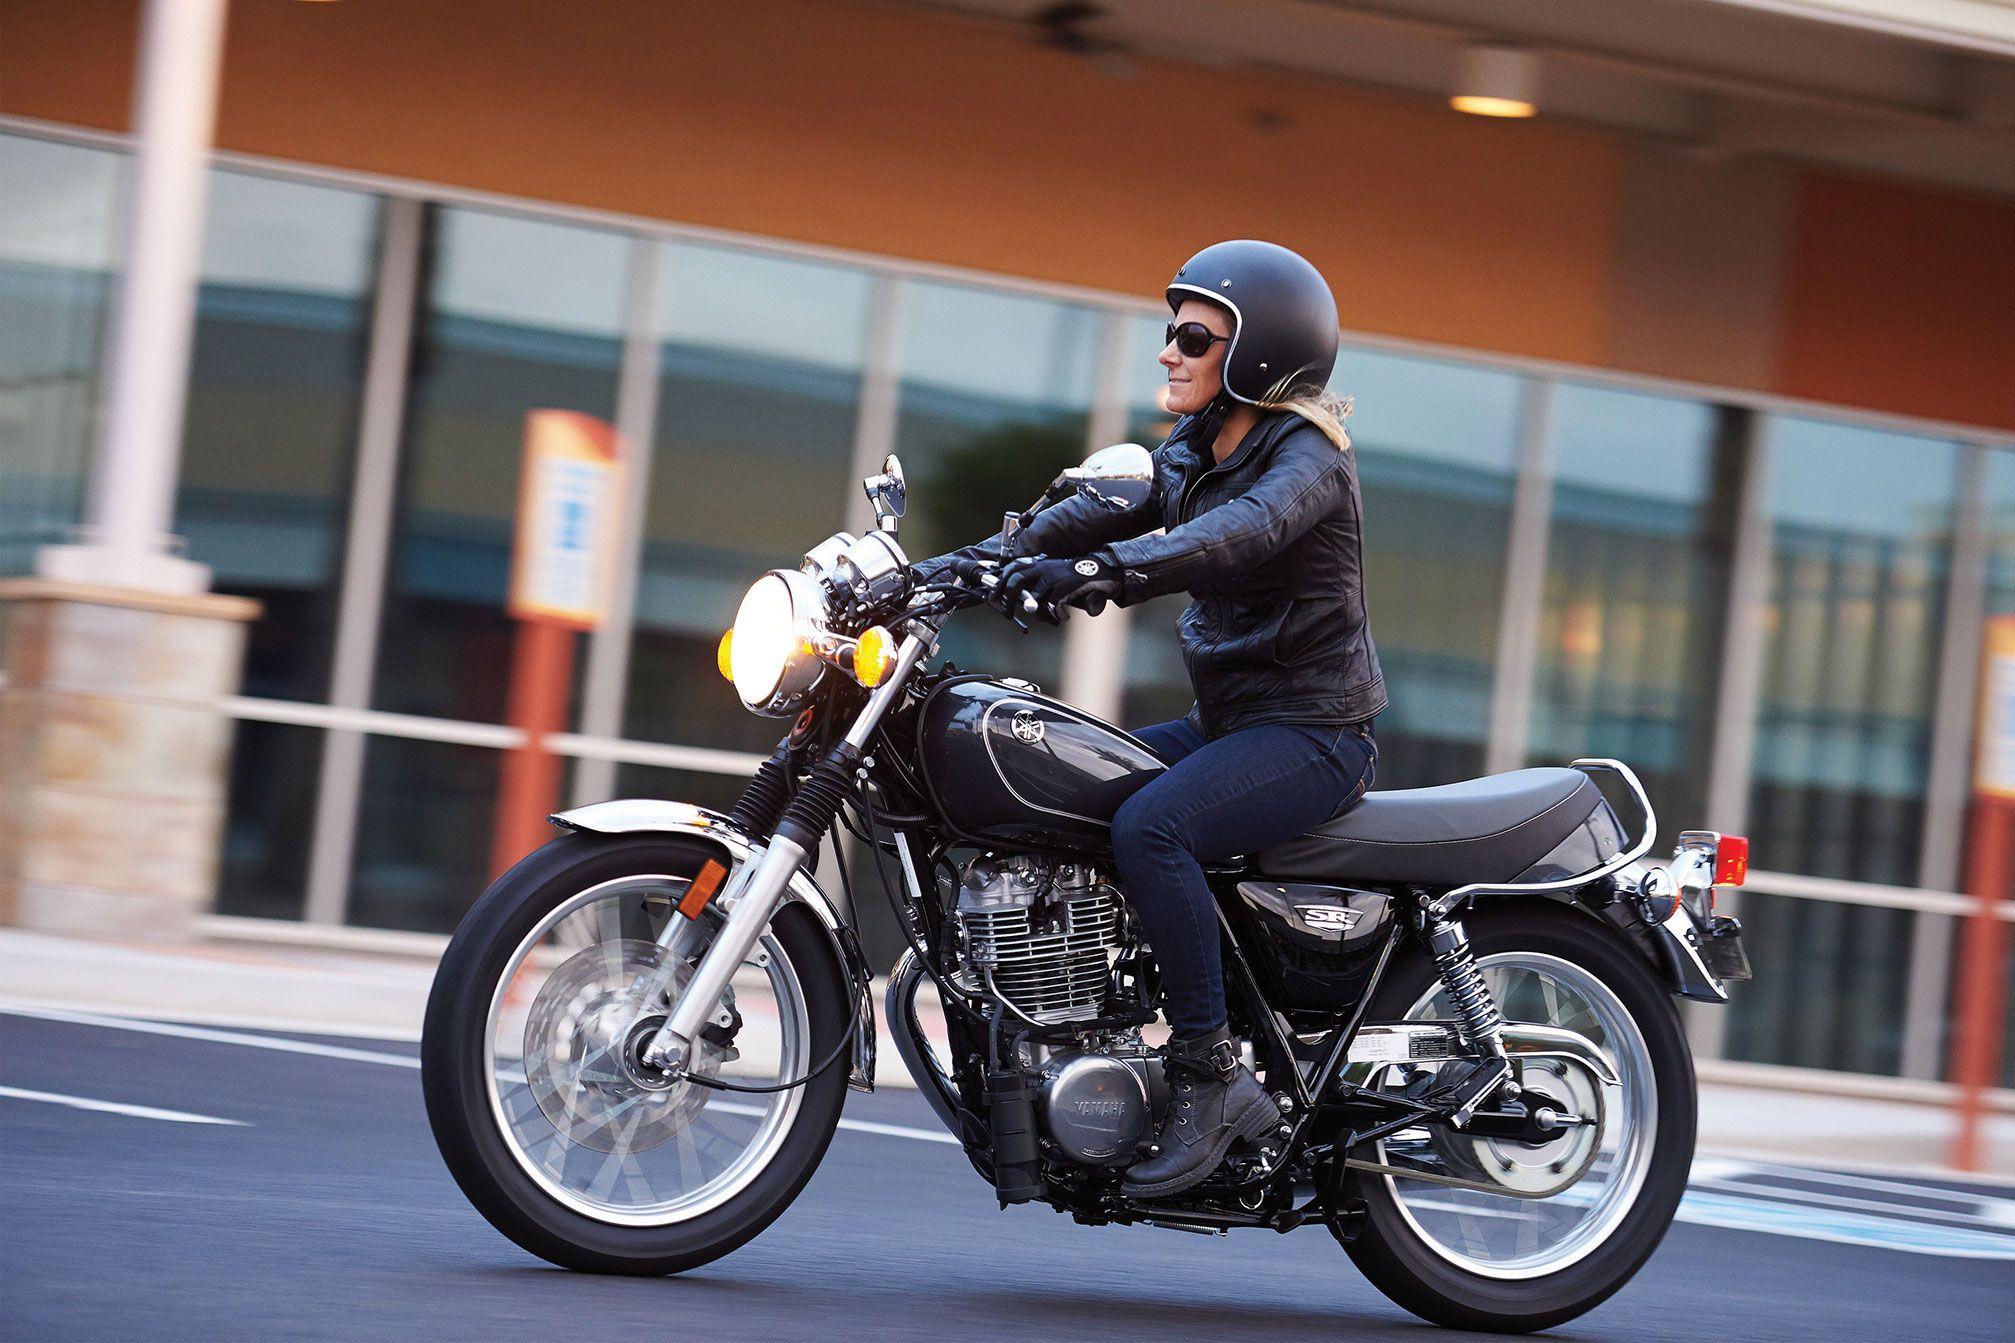 2015 Yamaha SR400 Review Motorcycles Pinterest